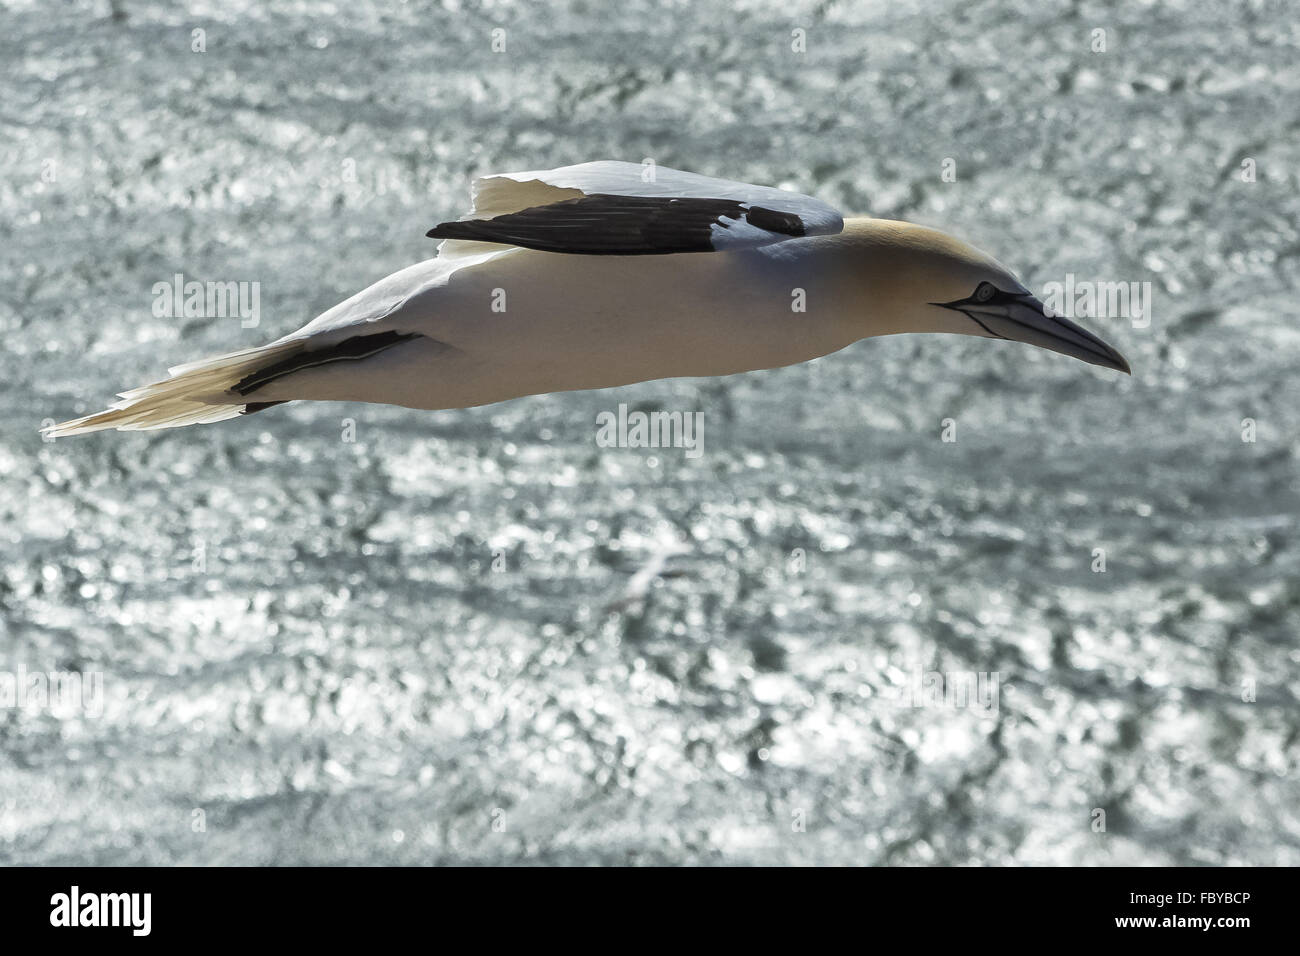 High-wing bird - Stock Image